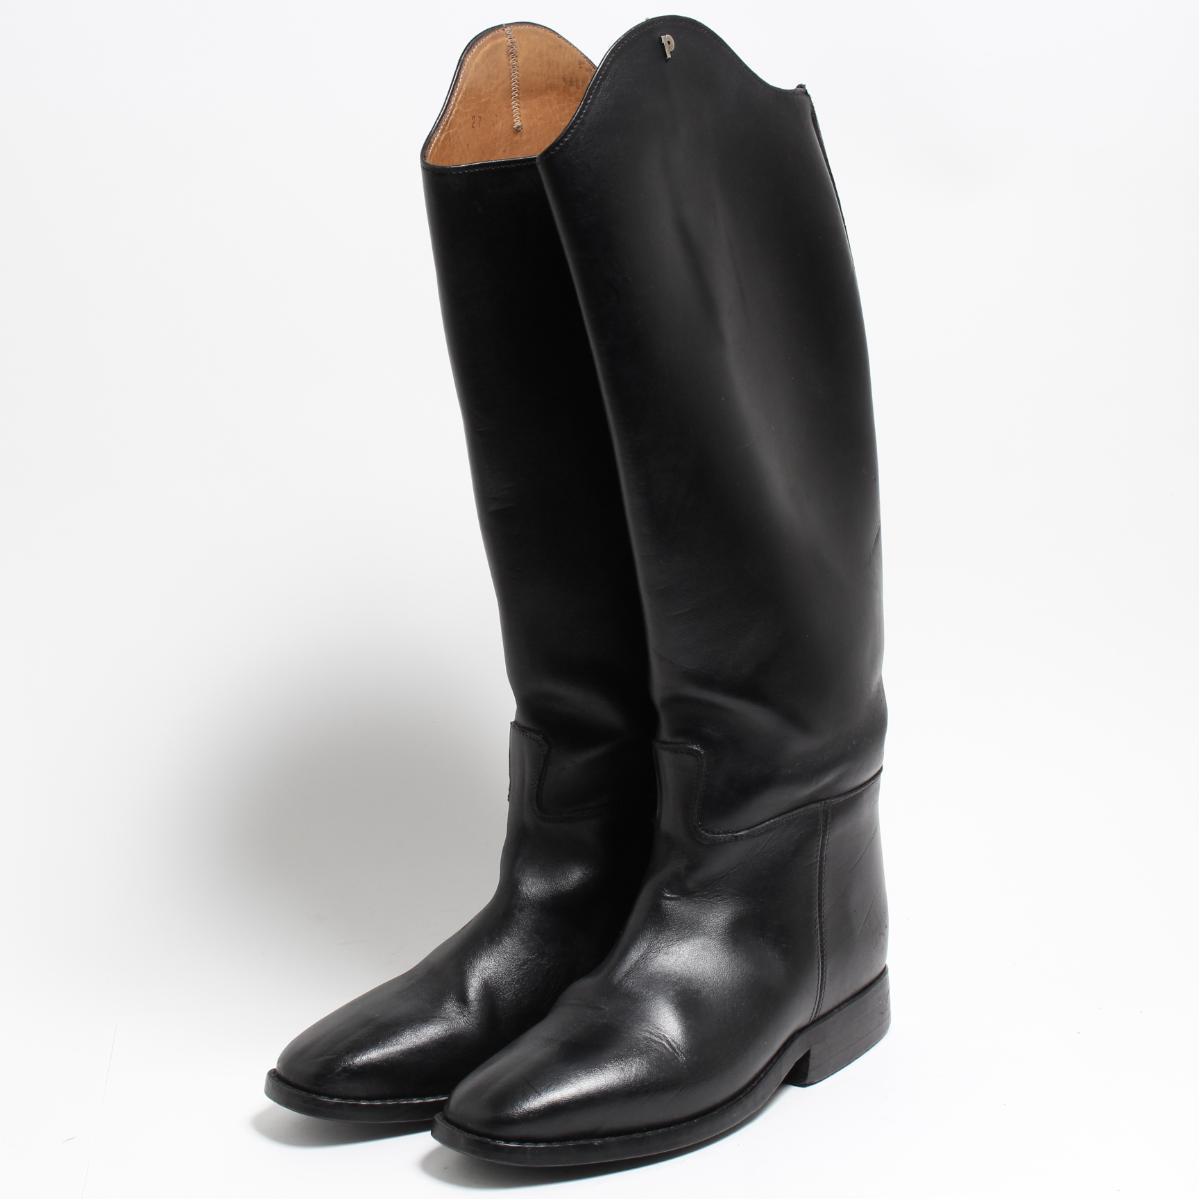 petrie ジョッキー乗馬ブーツ 4 レディース22.0cm /bon6097 【中古】 【180915】